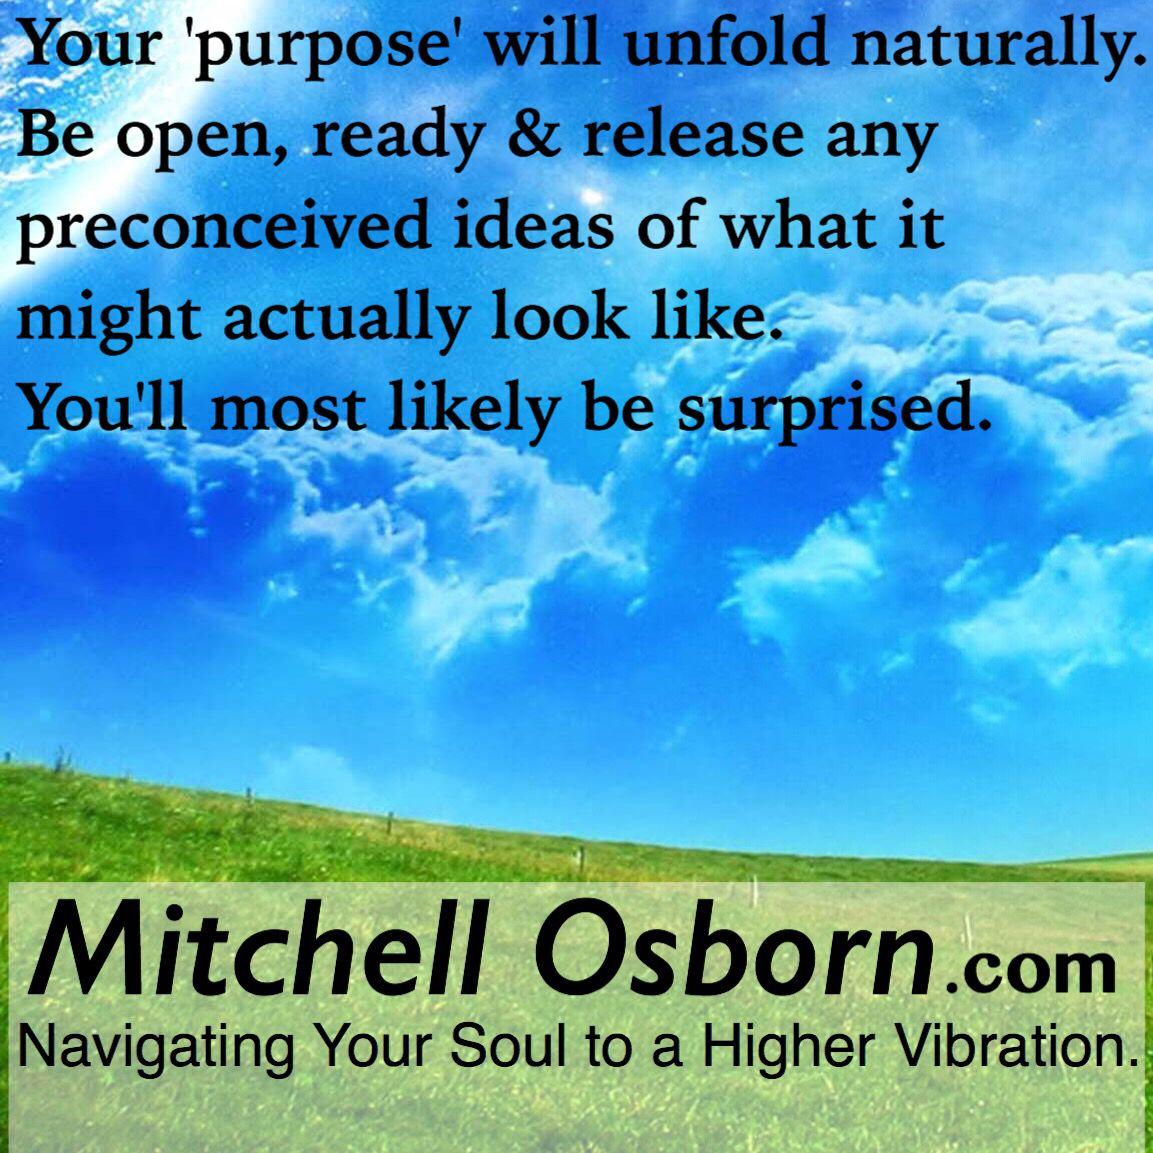 Intuitive words of wisdom. www.IntuitiveMitchell.com www.bit.ly/BOOKASESSION www.YouTube.com/IntuitiveMitchell #WUVIP #wellnessuniverse #psychic #petpsychic #tarot #medium #mitchellosborn #intuitivesoulcoach #soul coach #dreaminterpretor #hypnosis #hypnotherapy #lenormand #wufriends #mitch #osborn #OrlandoTarotTribe #orlandostrong #pulse  #pulseorlando #orlandounited